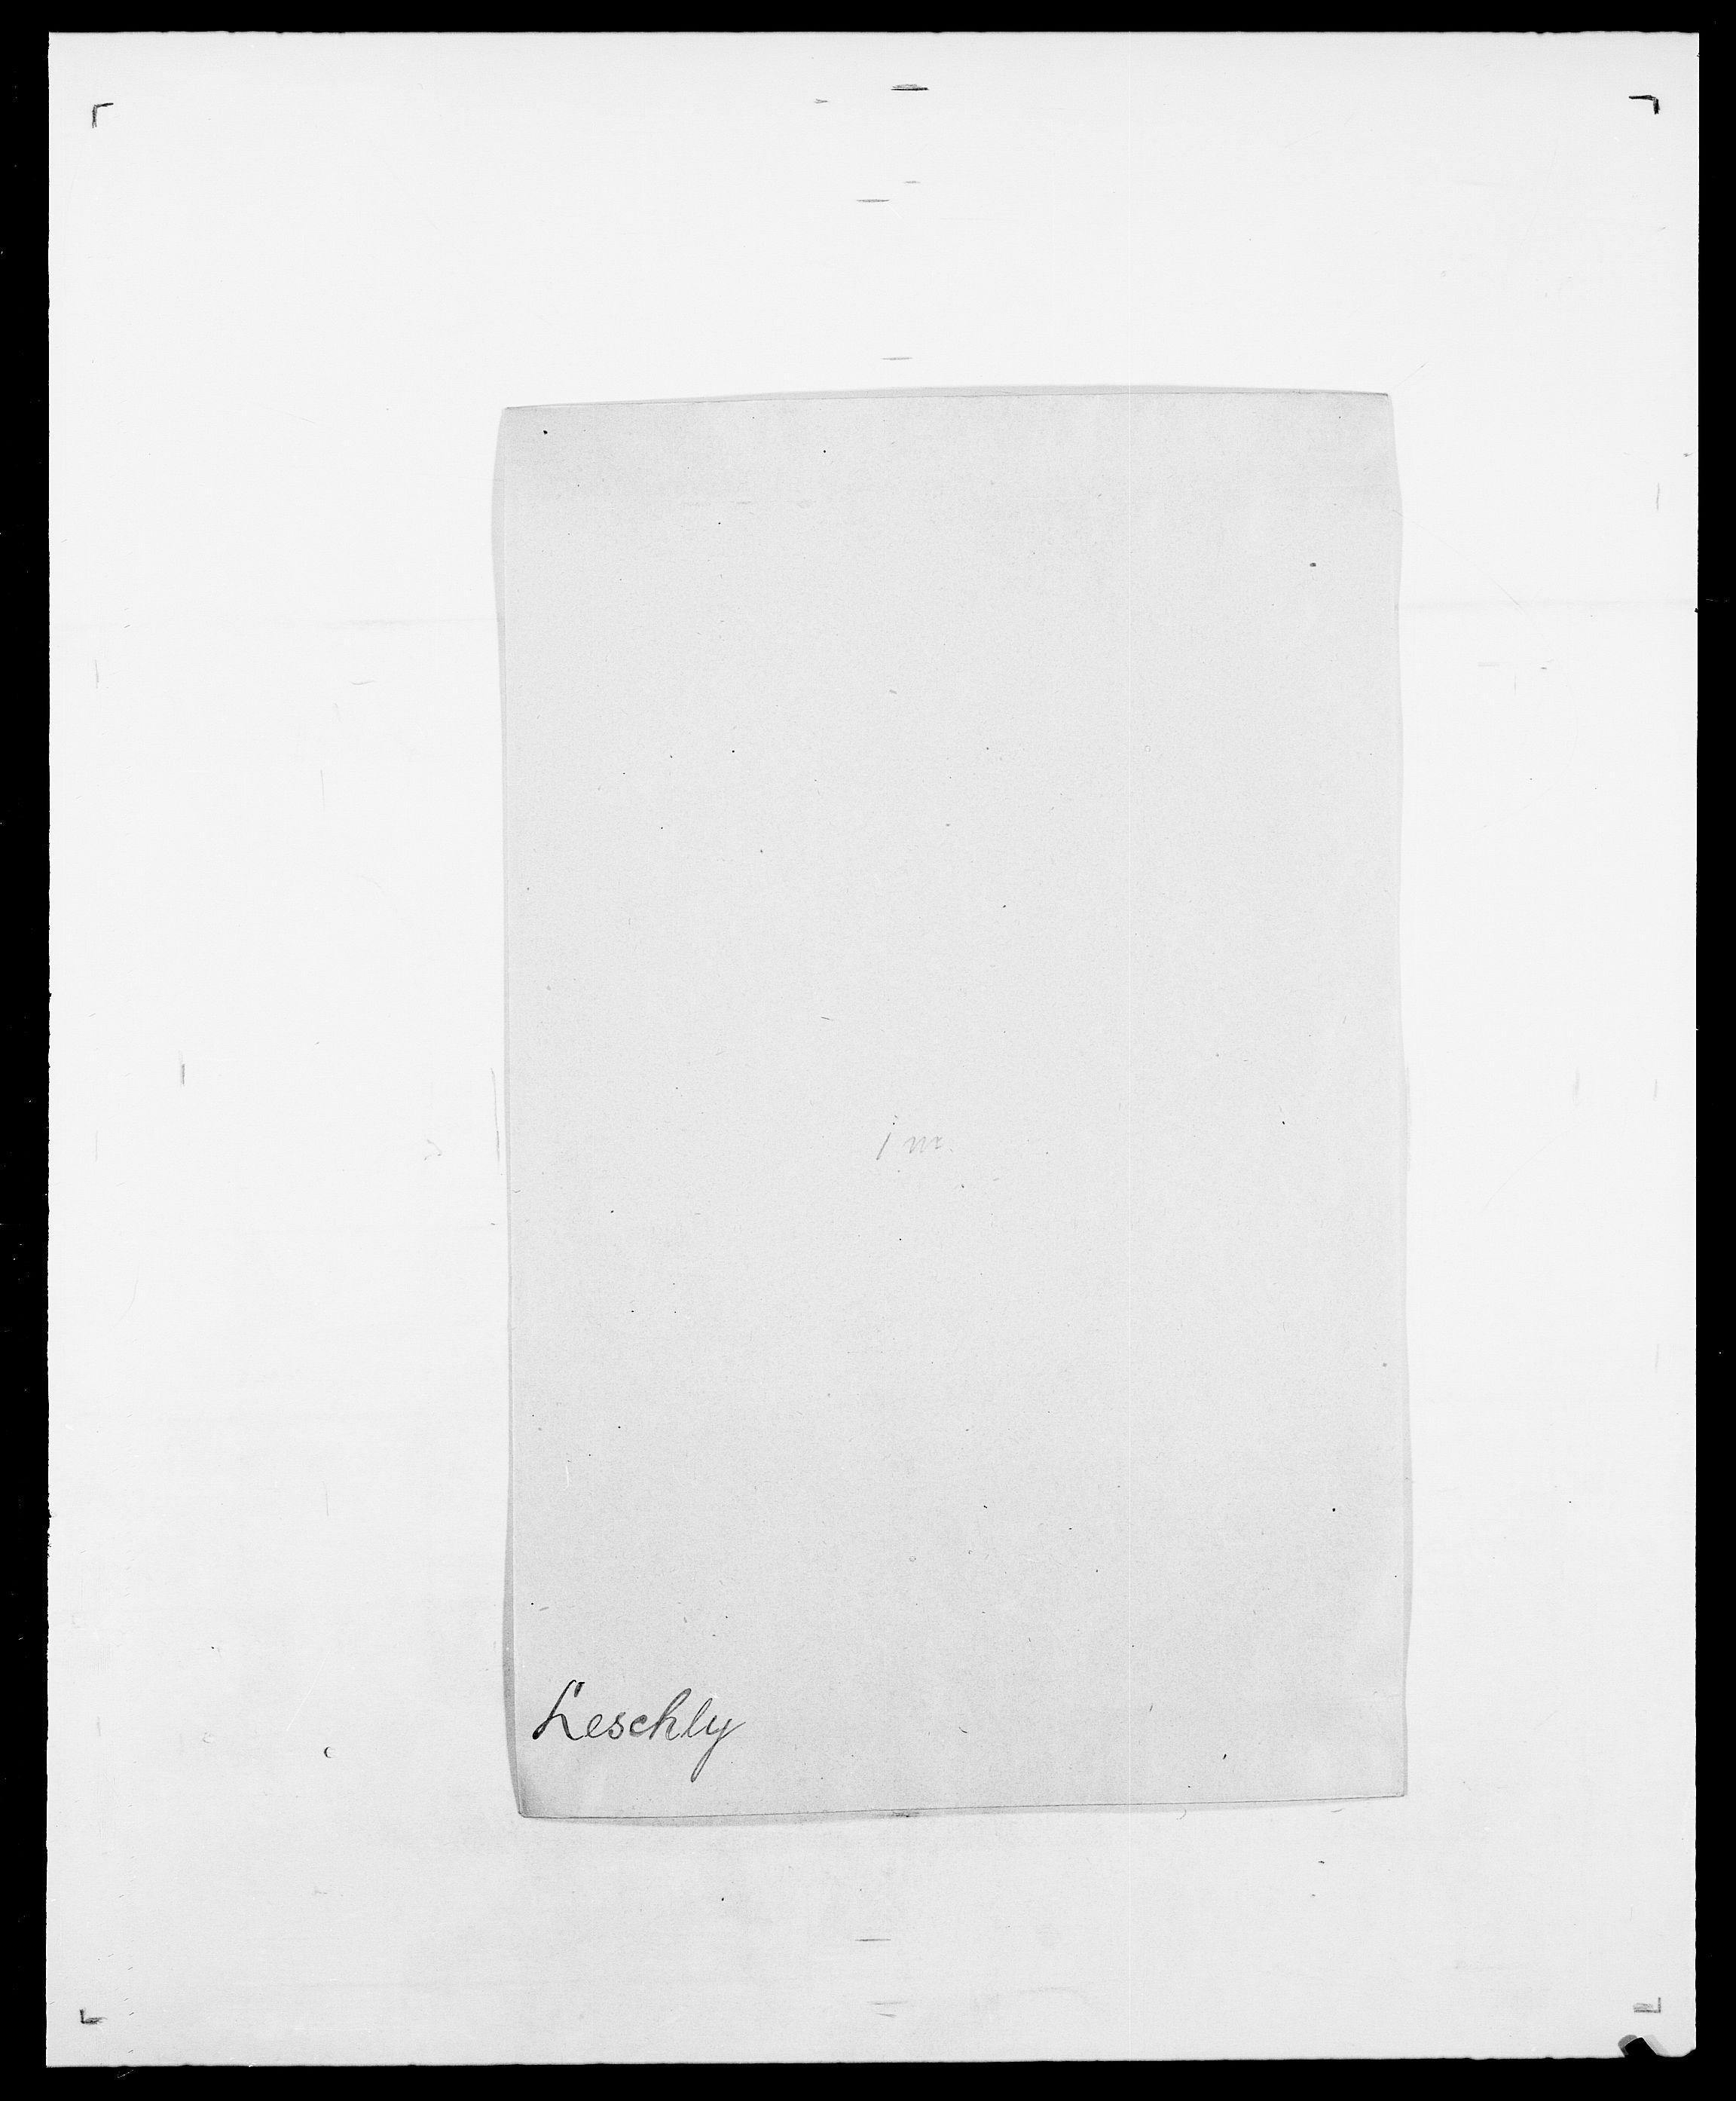 SAO, Delgobe, Charles Antoine - samling, D/Da/L0023: Lau - Lirvyn, s. 248